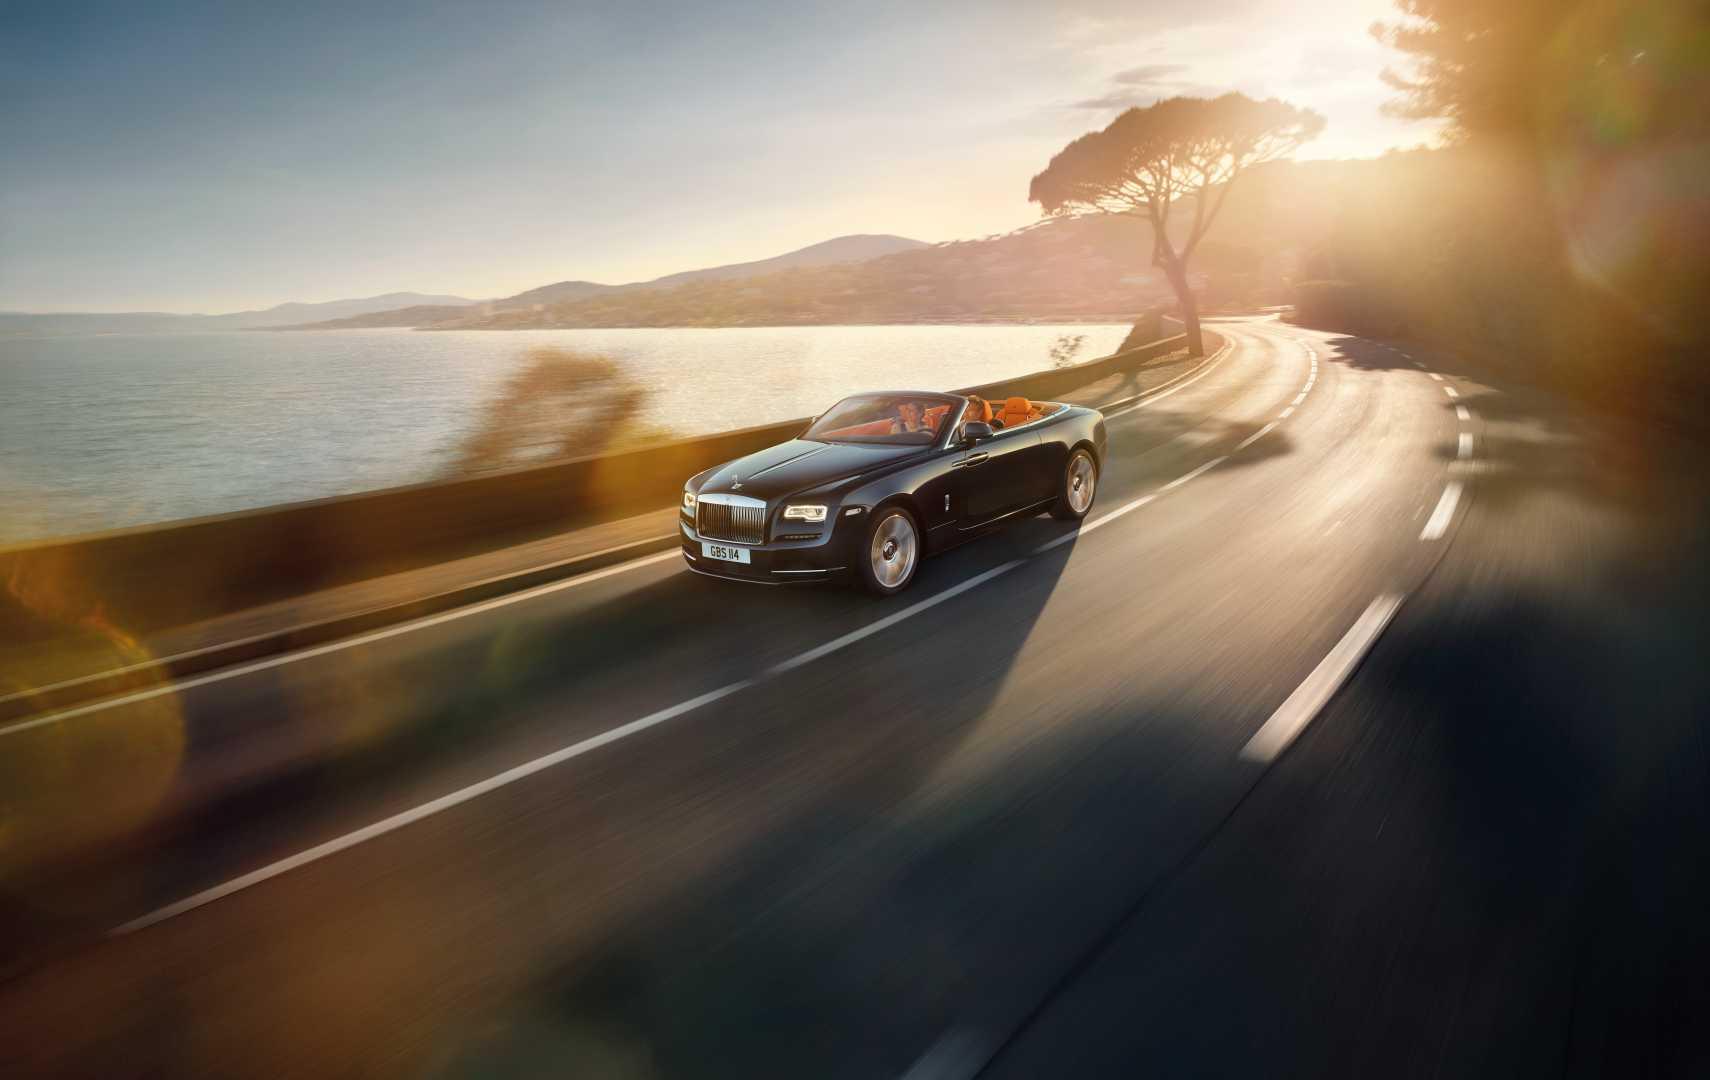 Rolls-Royce Motor Cars celebrates second highest sales record